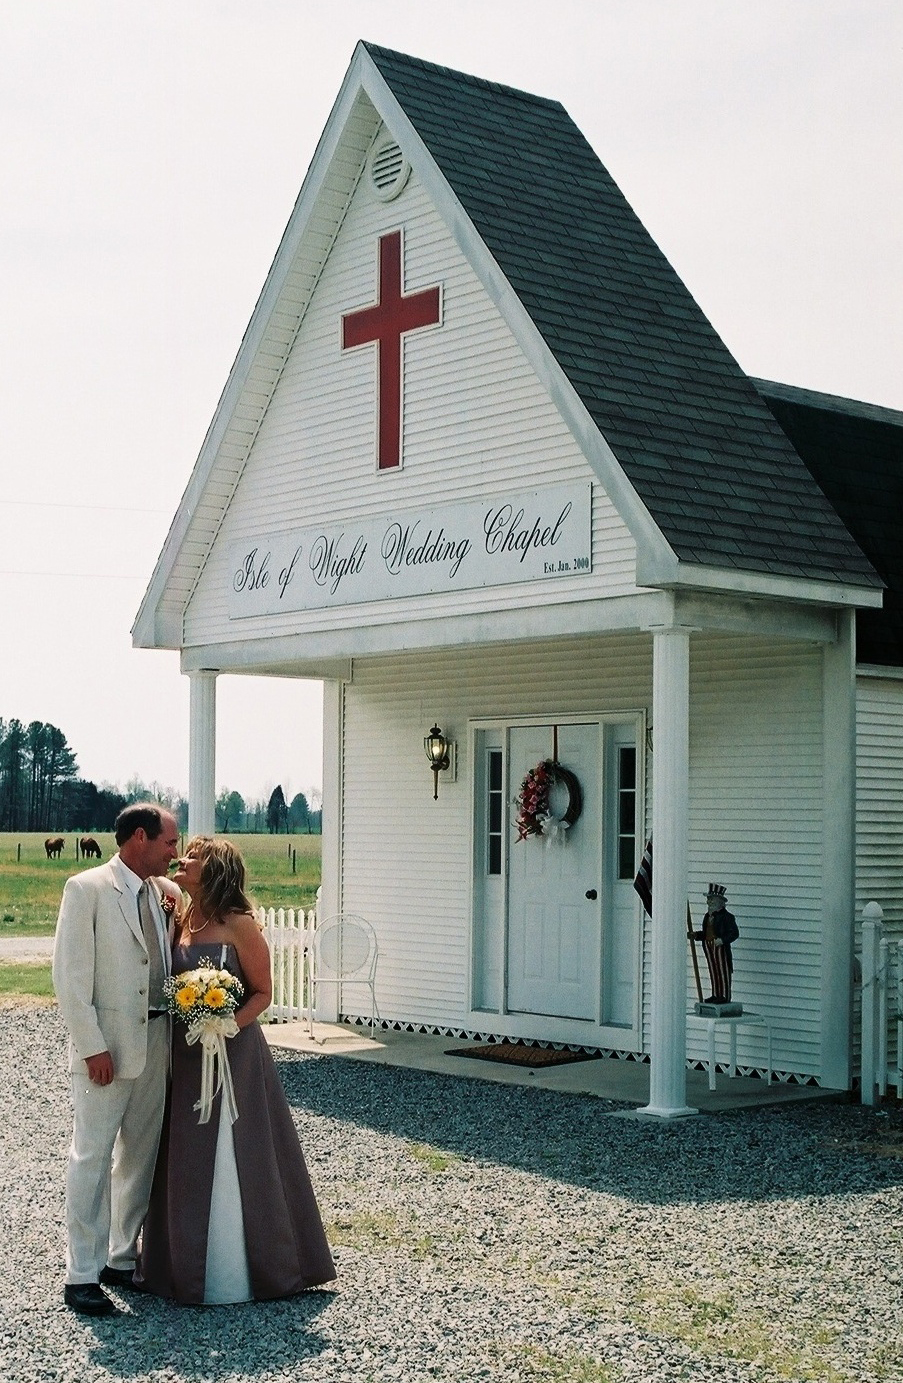 Isle Of Wight Wedding Chapel Business Genuine Smithfield